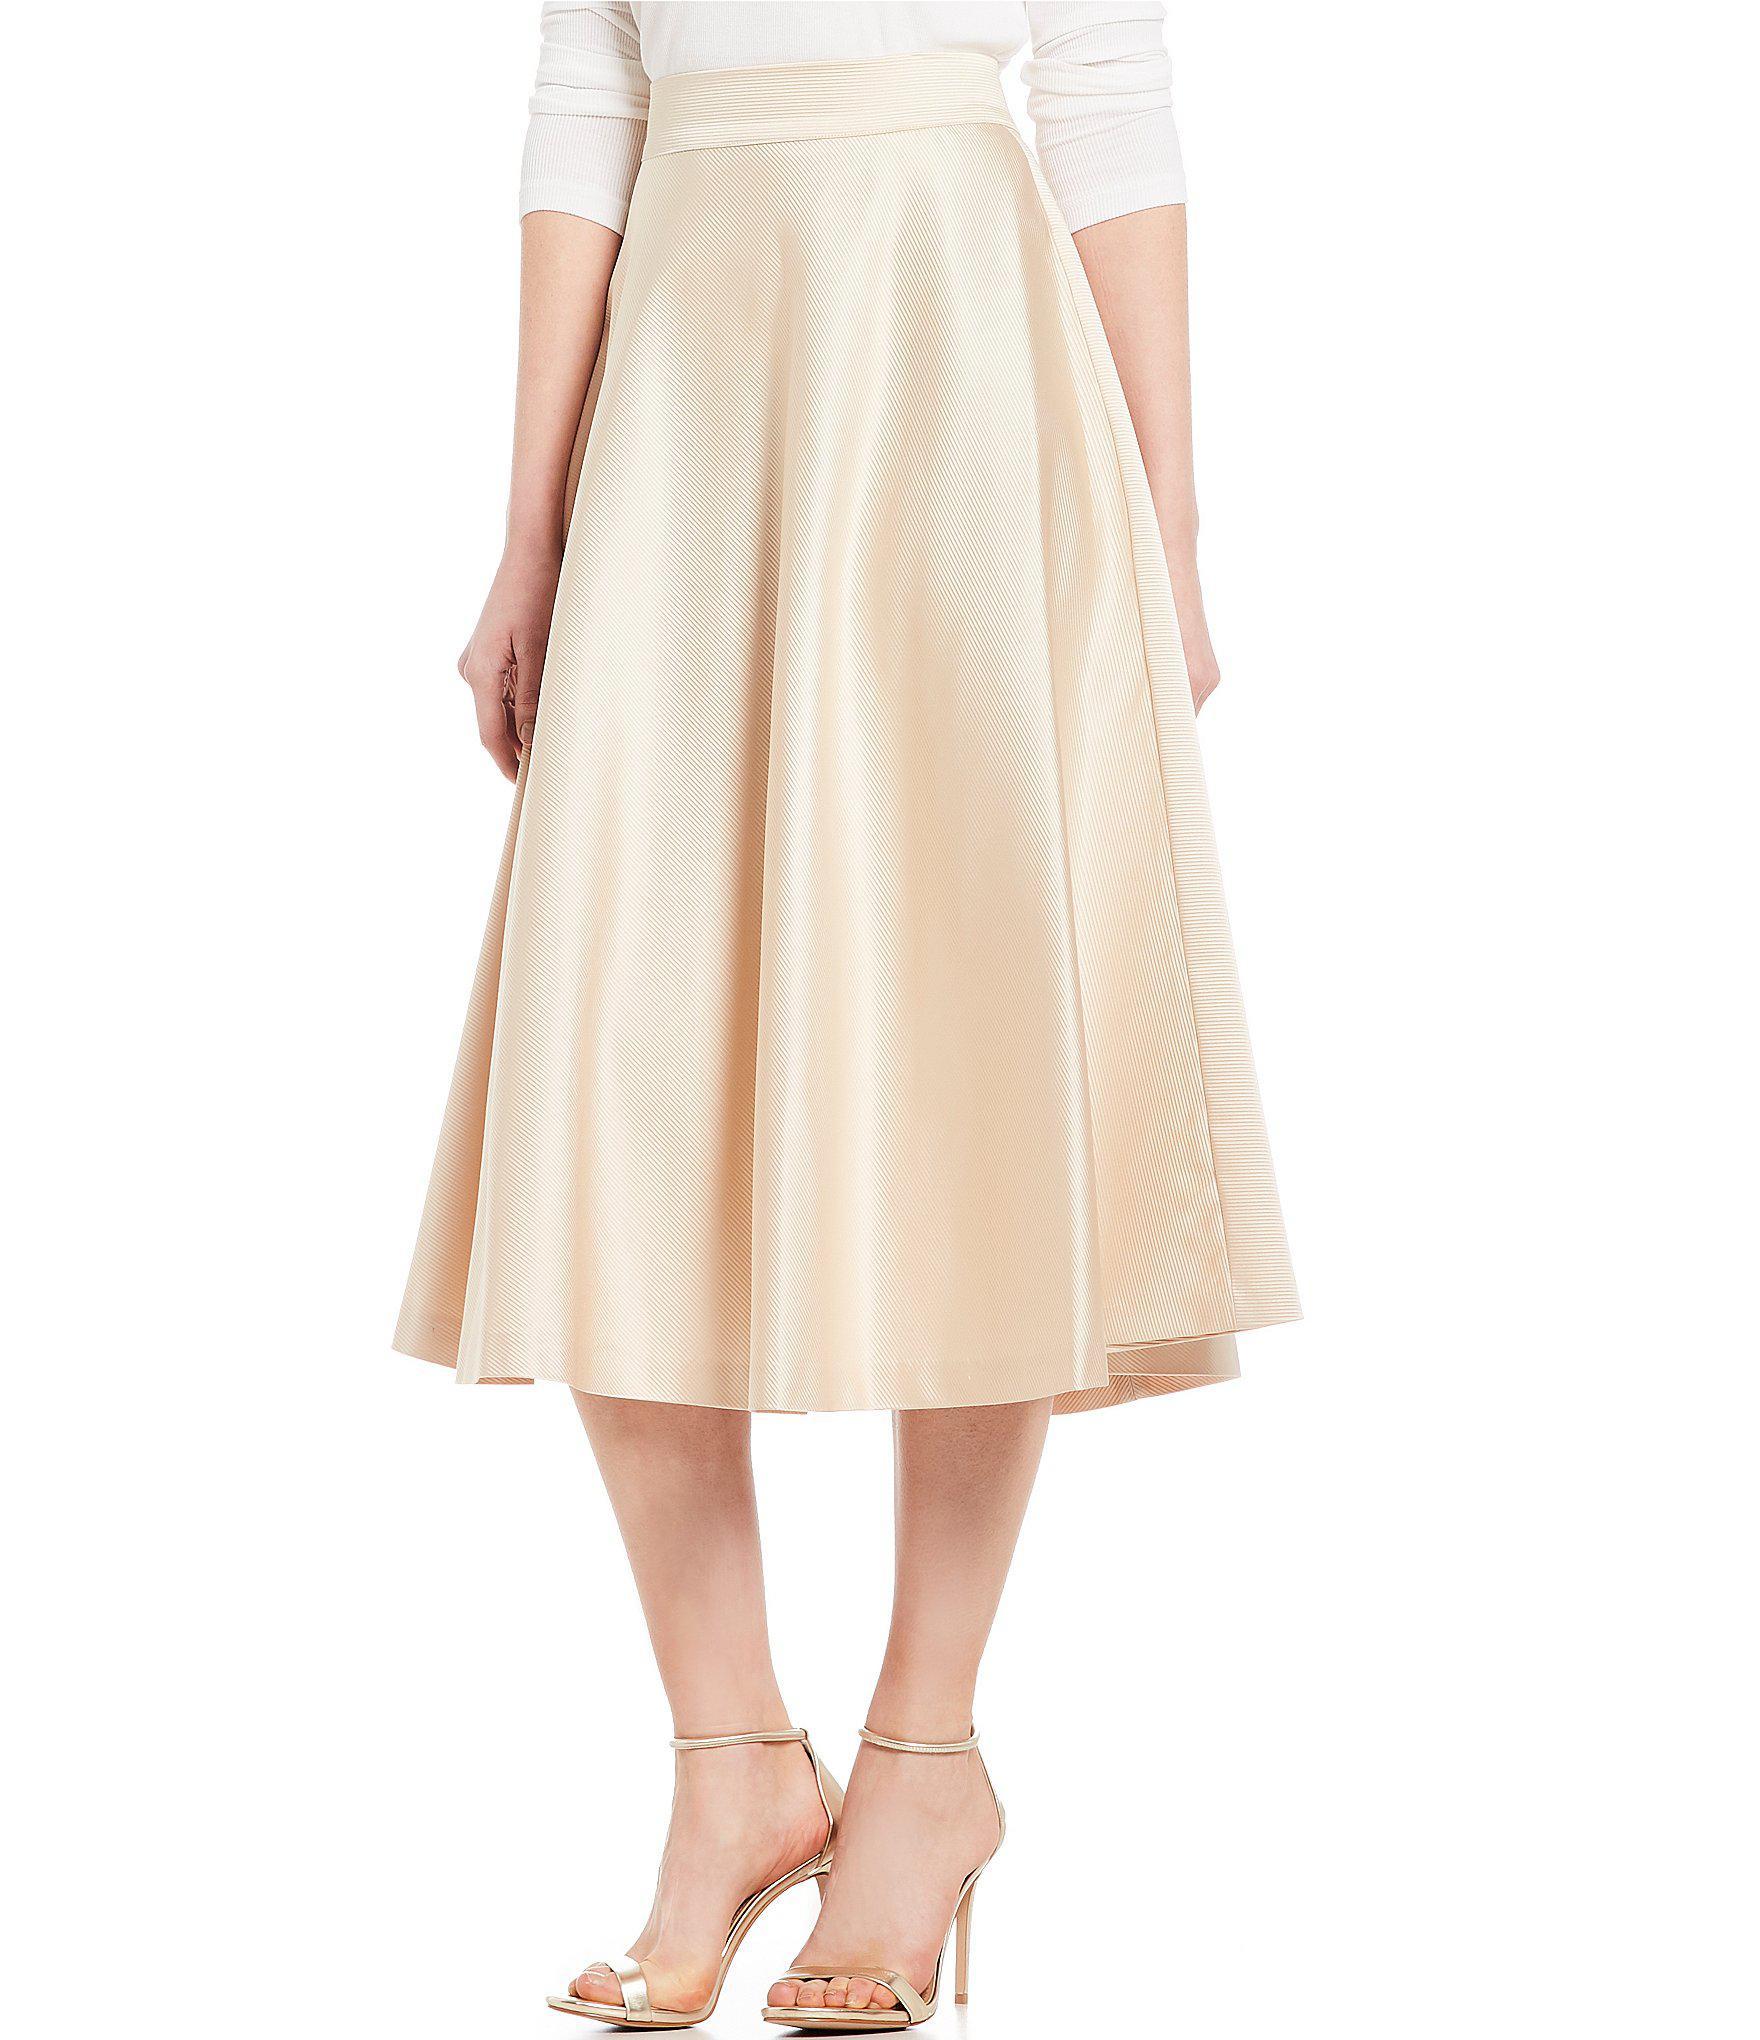 cef93fc9db9c Cremieux Delores A-line Midi Skirt in Metallic - Lyst